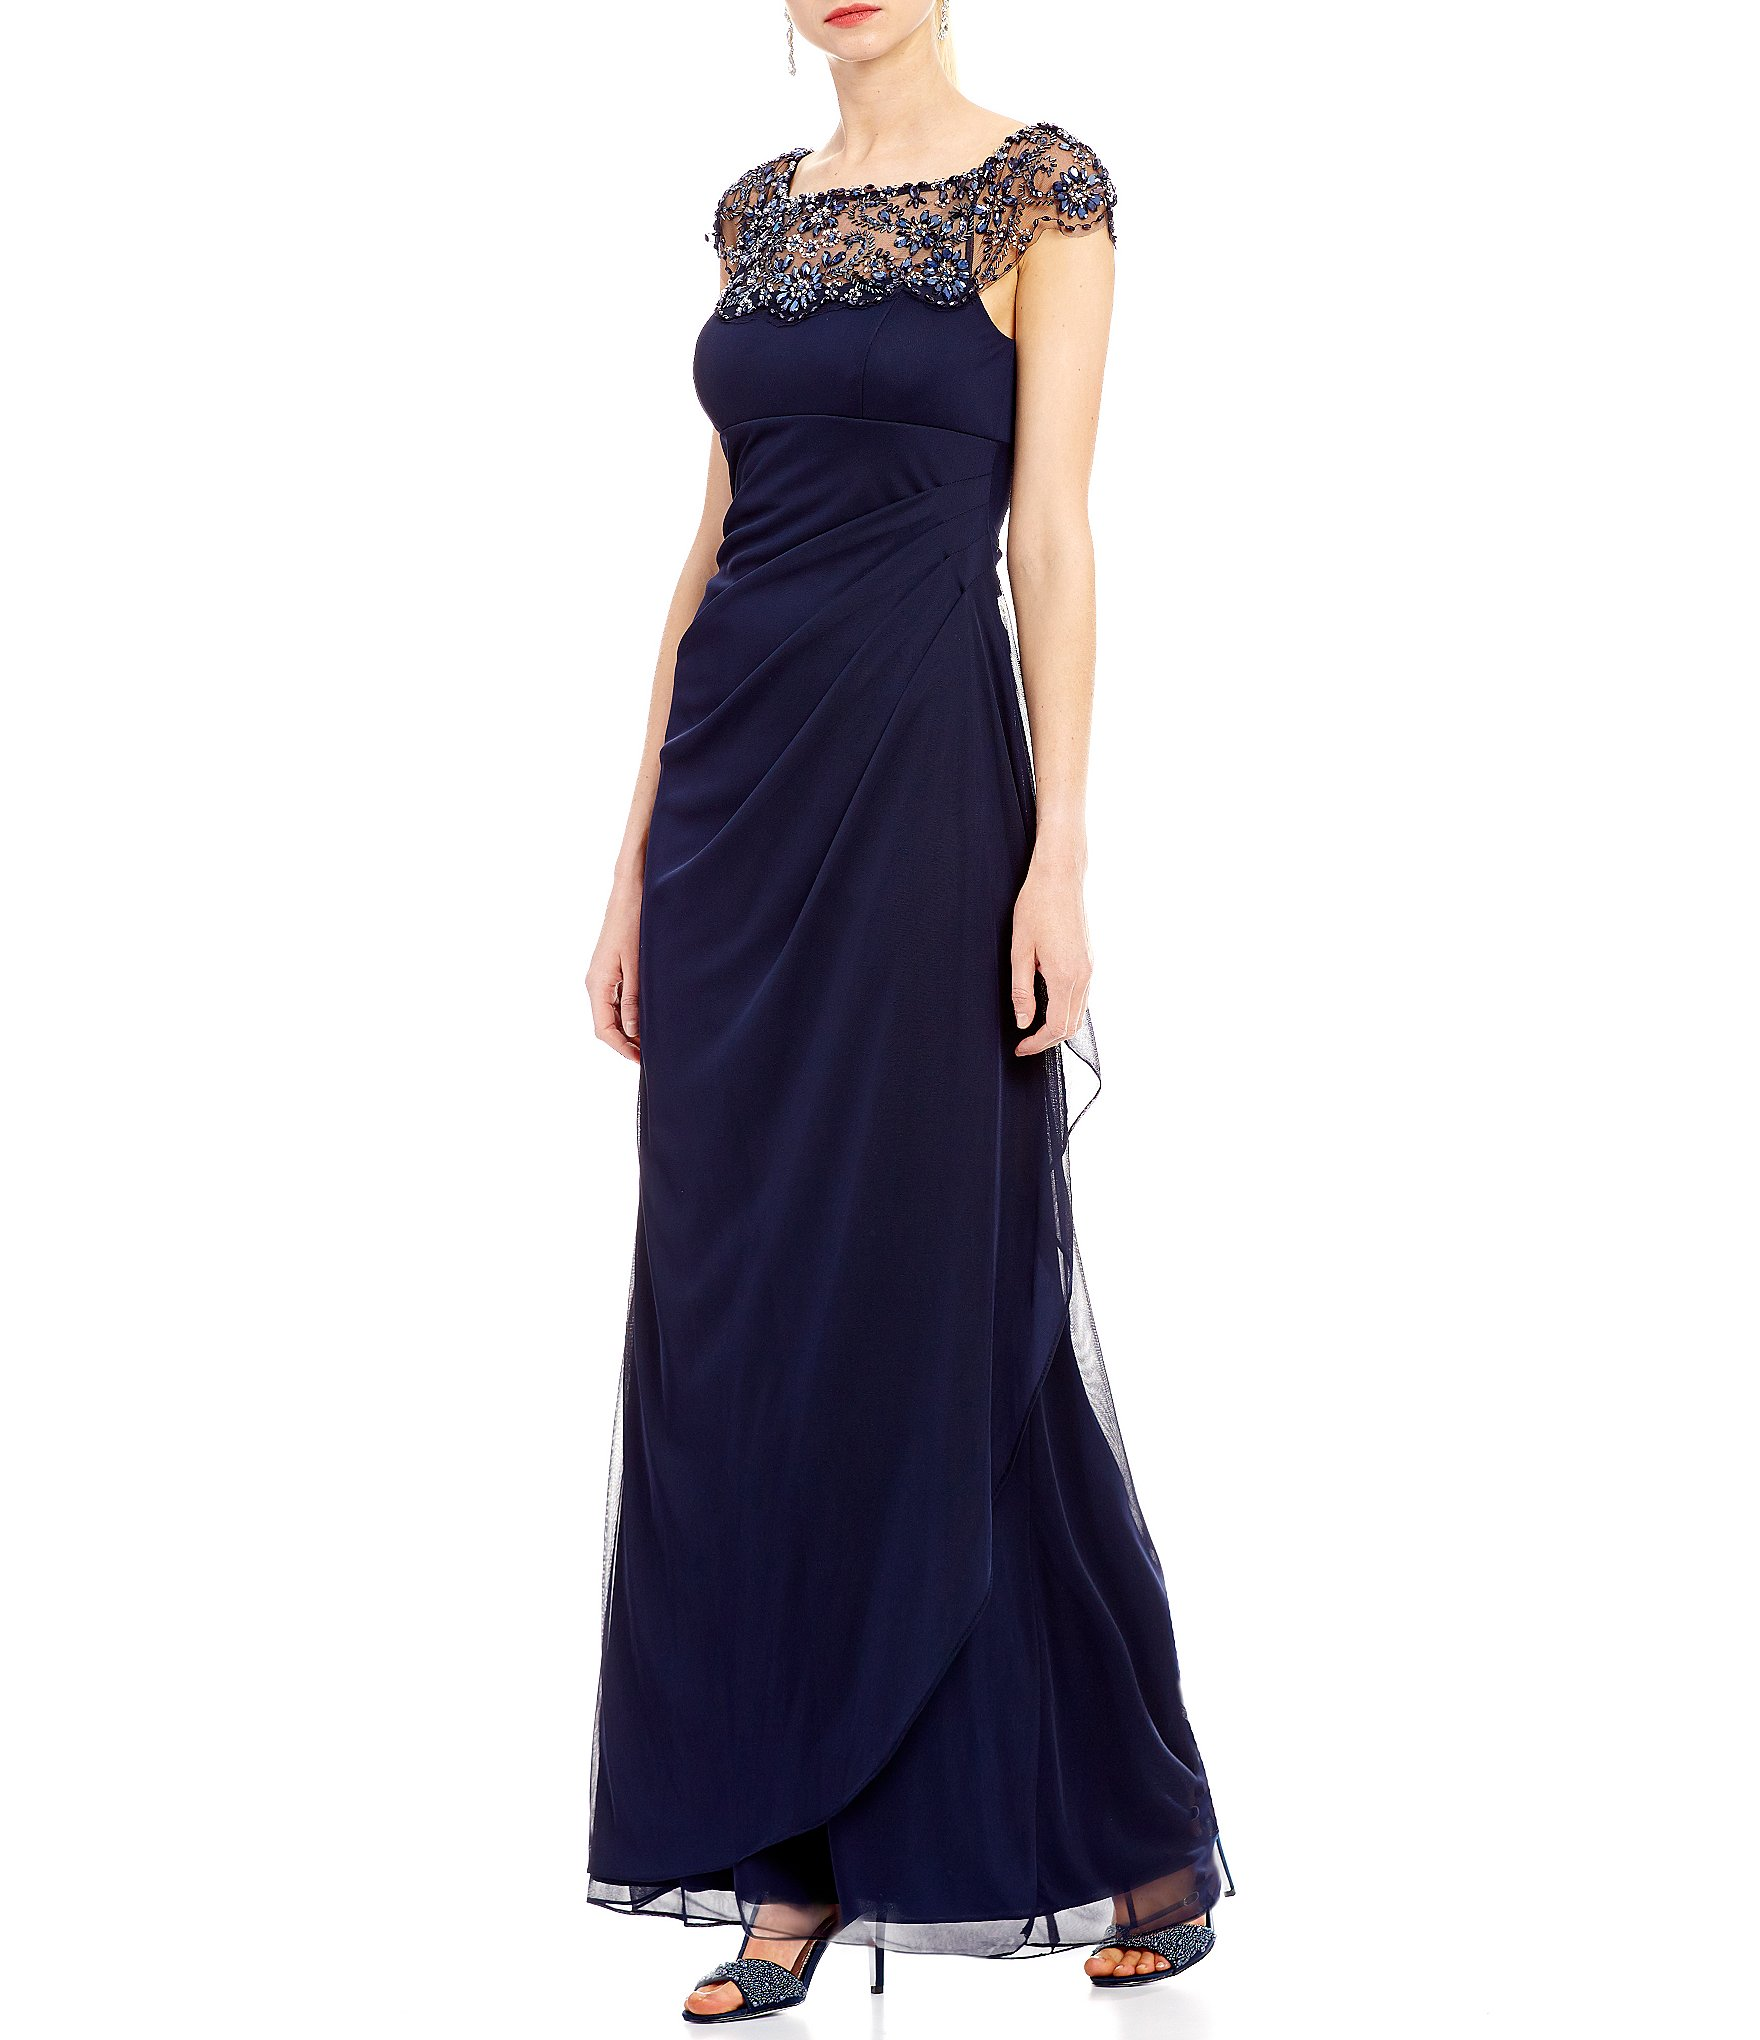 Xscape Cap-Sleeve Long Mother of the Bride Dresses | Dillards